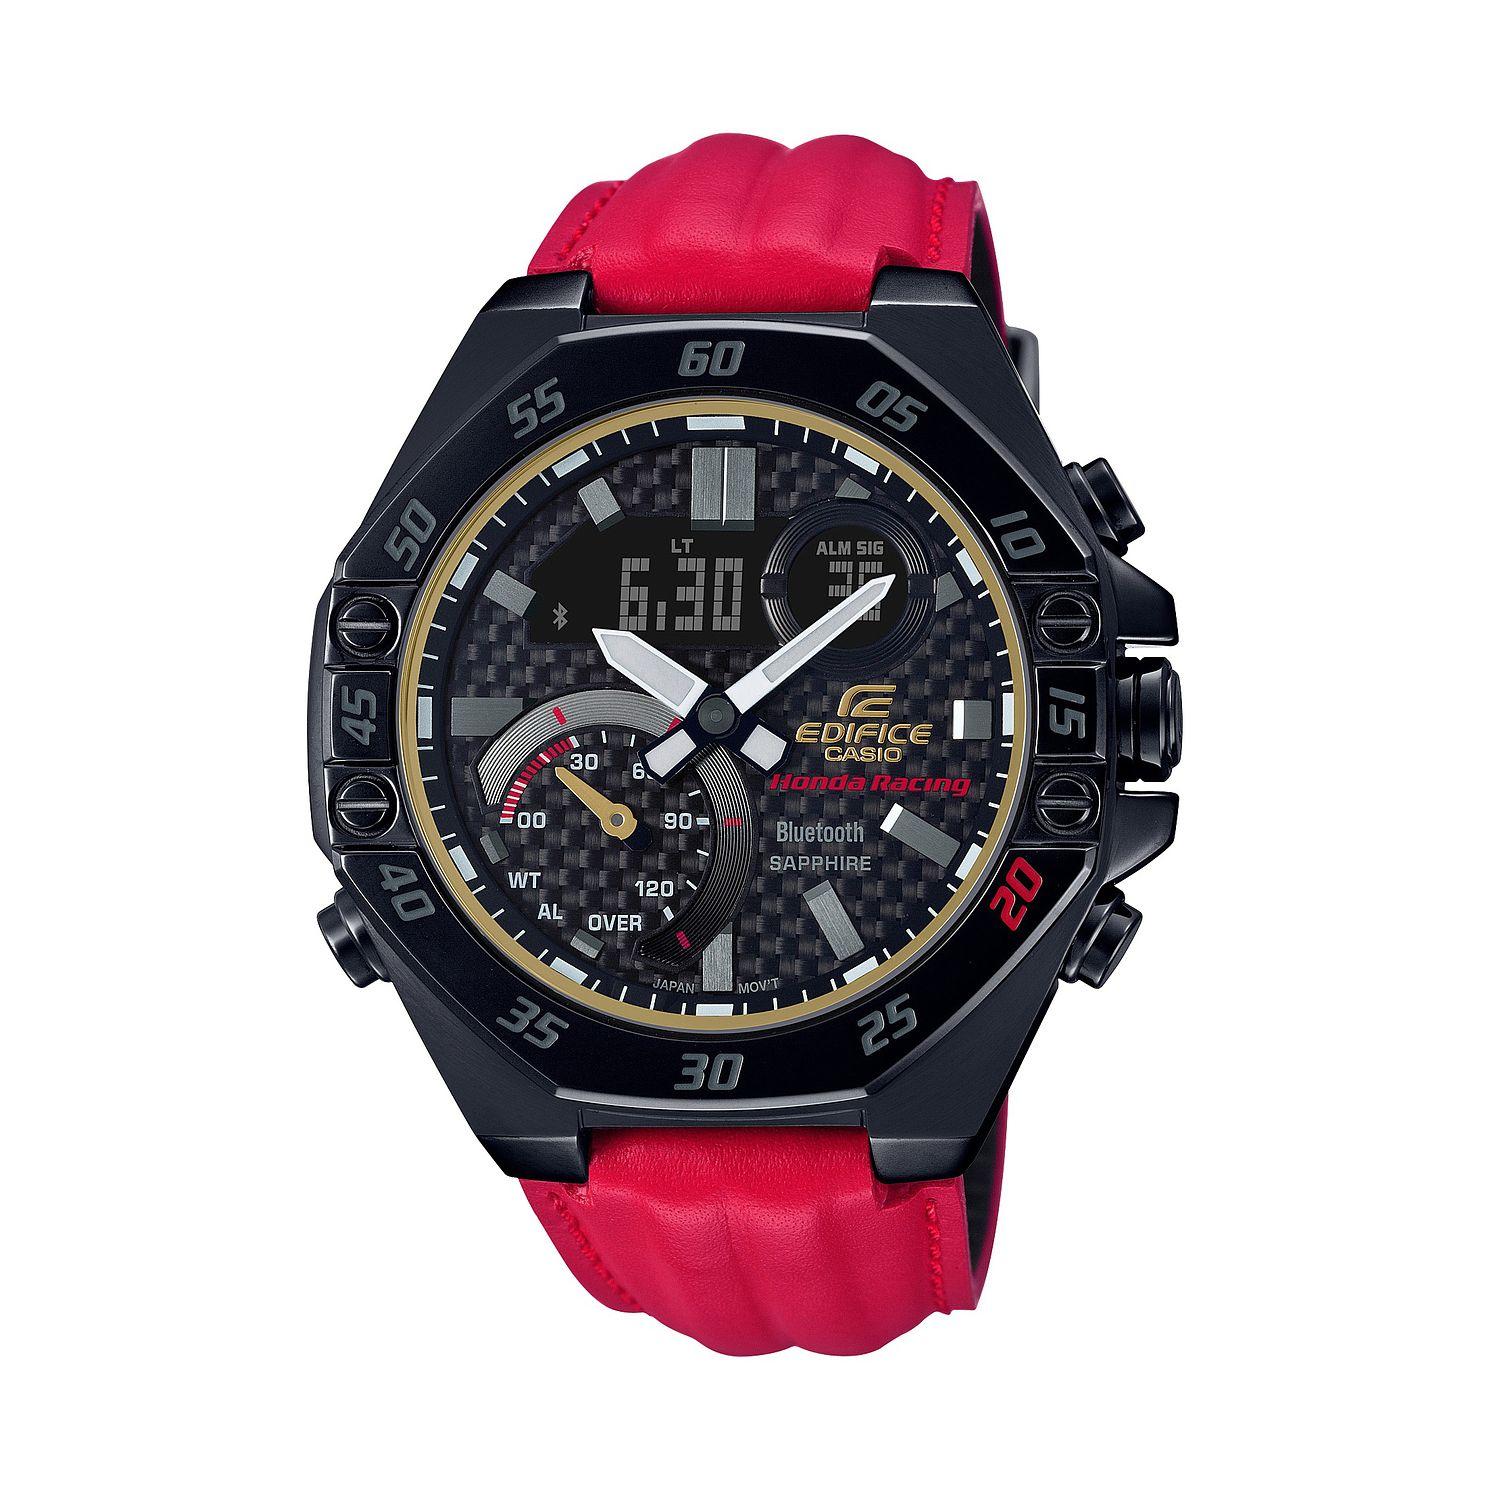 Casio Edifice Honda Red Resin Strap Watch £119.20 at H Samuel